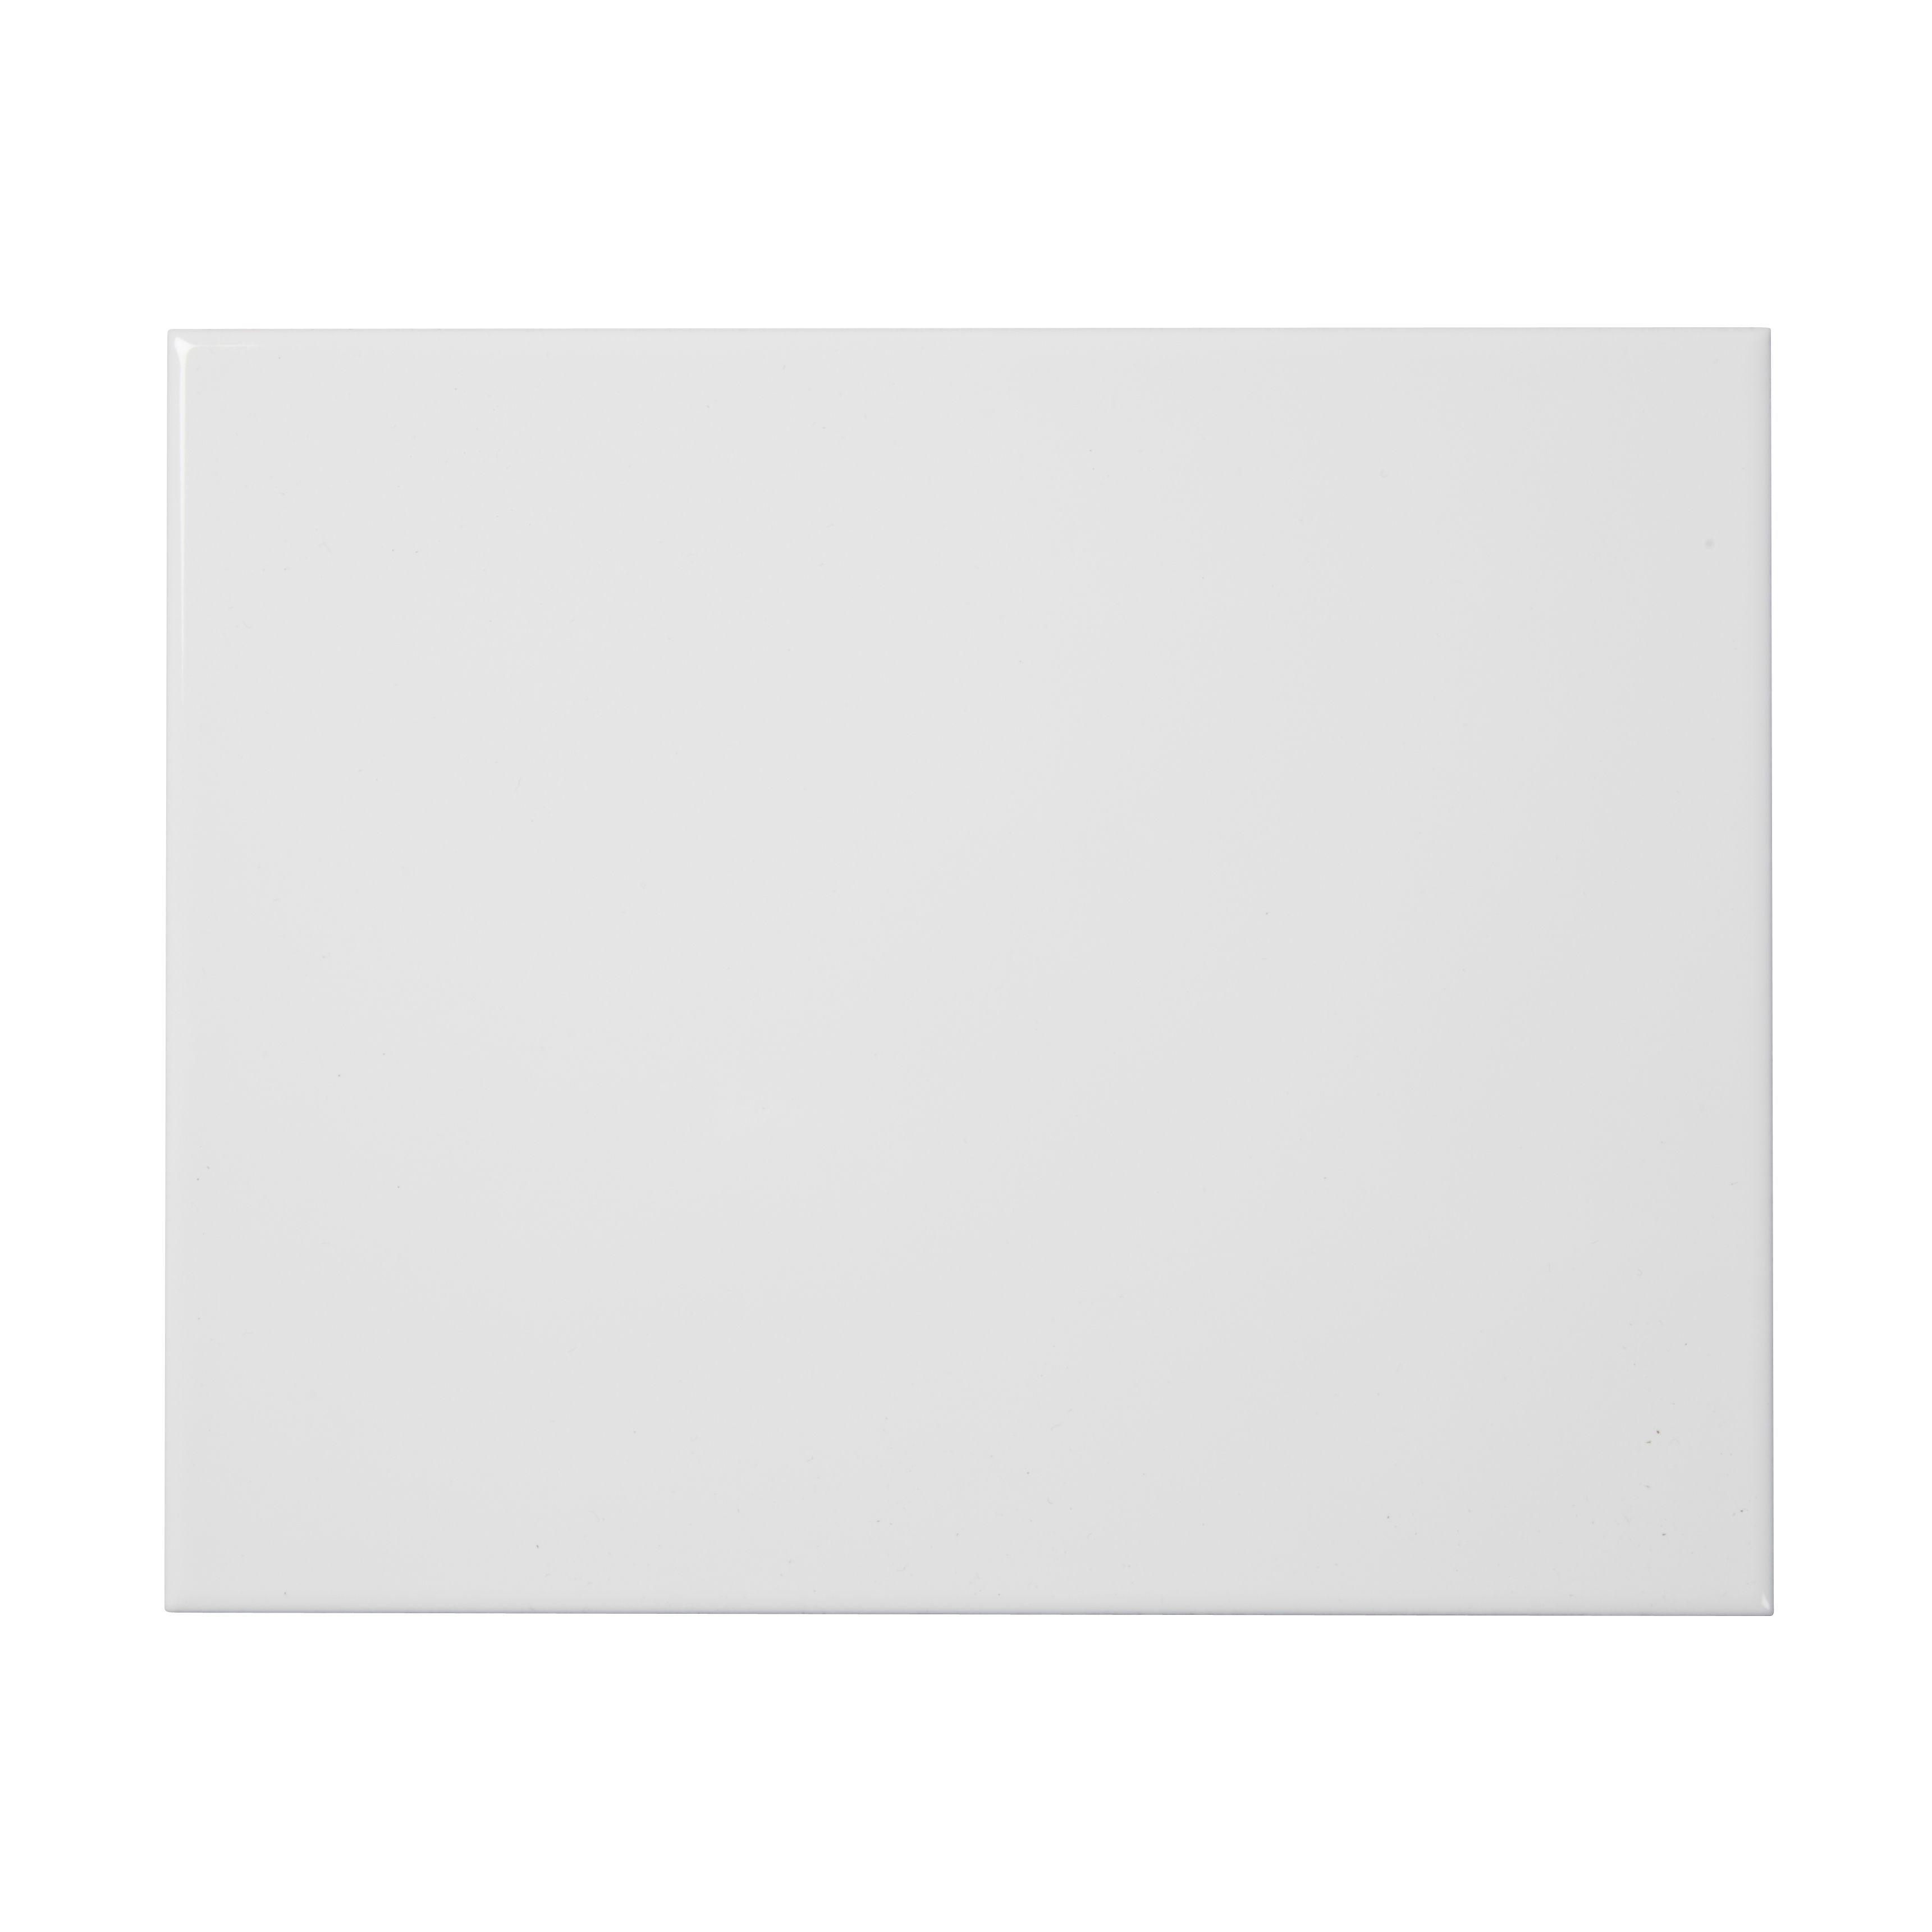 Holborn White Ceramic Wall Tile Pack Of 20 L 250mm W: Spezzia White Gloss Ceramic Wall Tile, Pack Of 20, (L